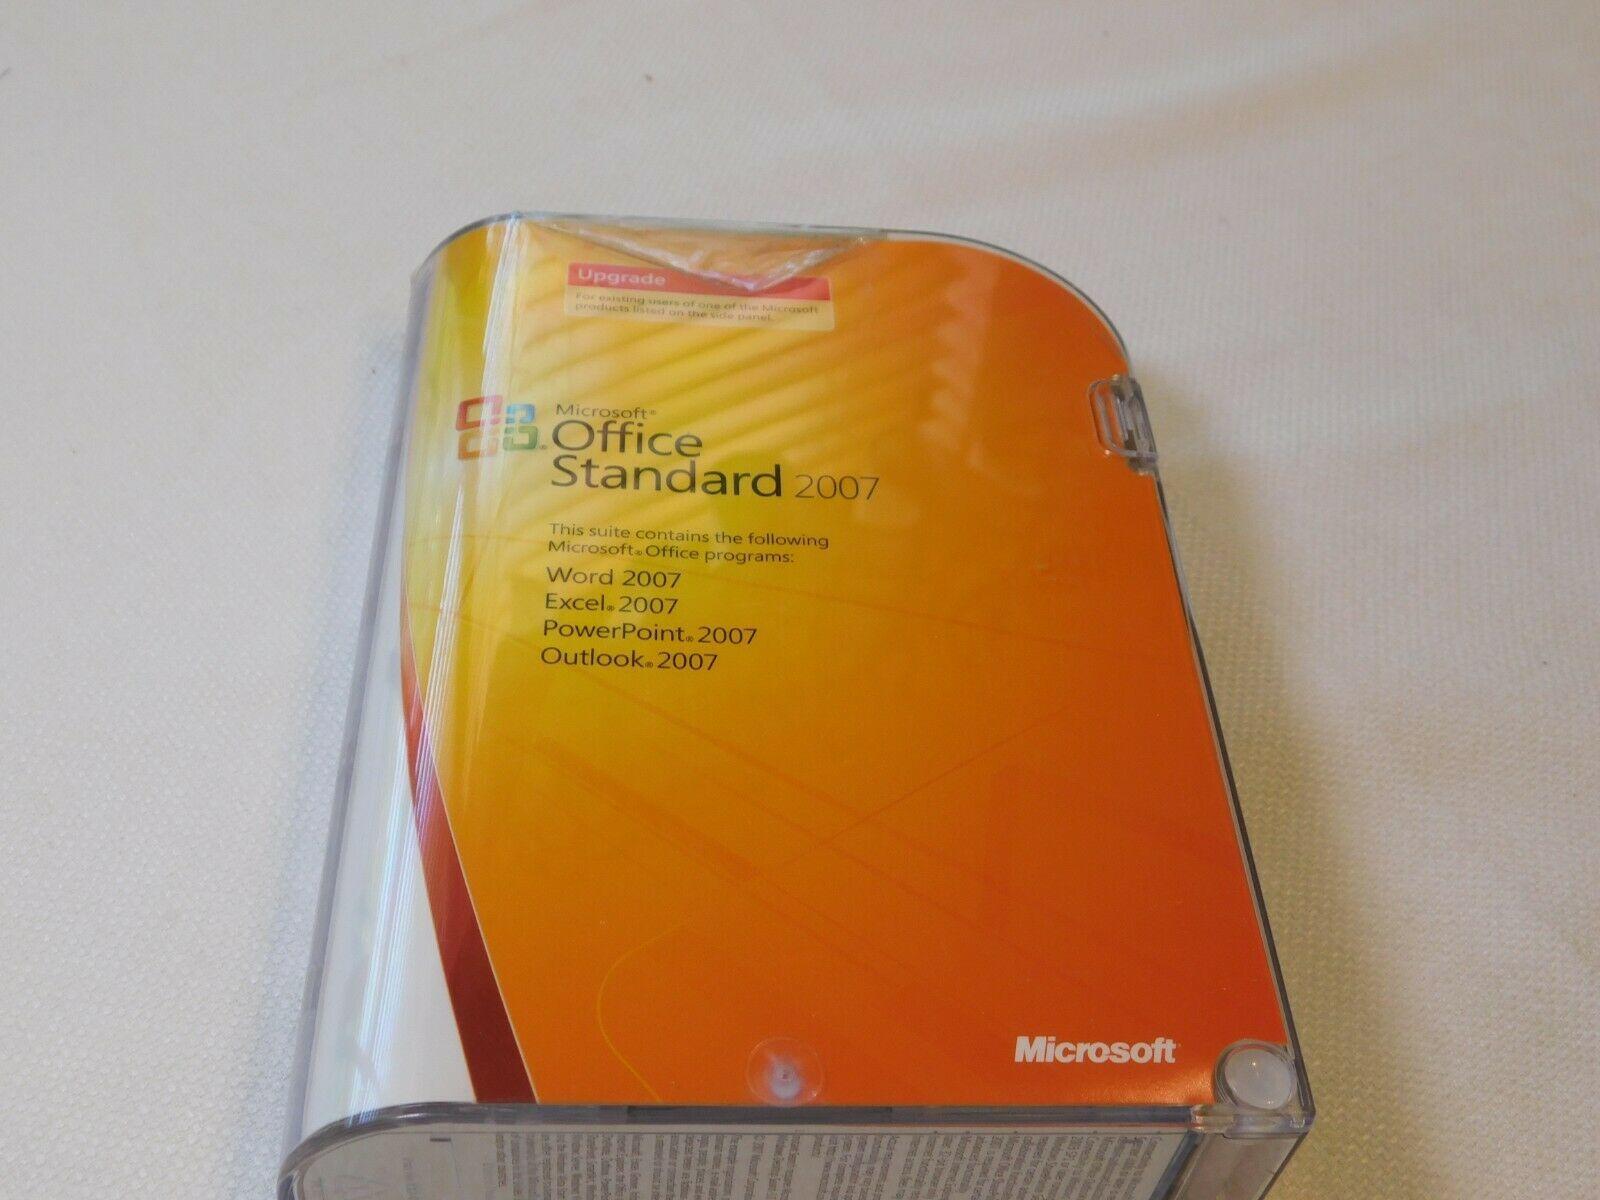 Microsoft Büro Standard 2007 PC Upgrade 021-07668 Geöffnet NOS Neu Word Excel image 2